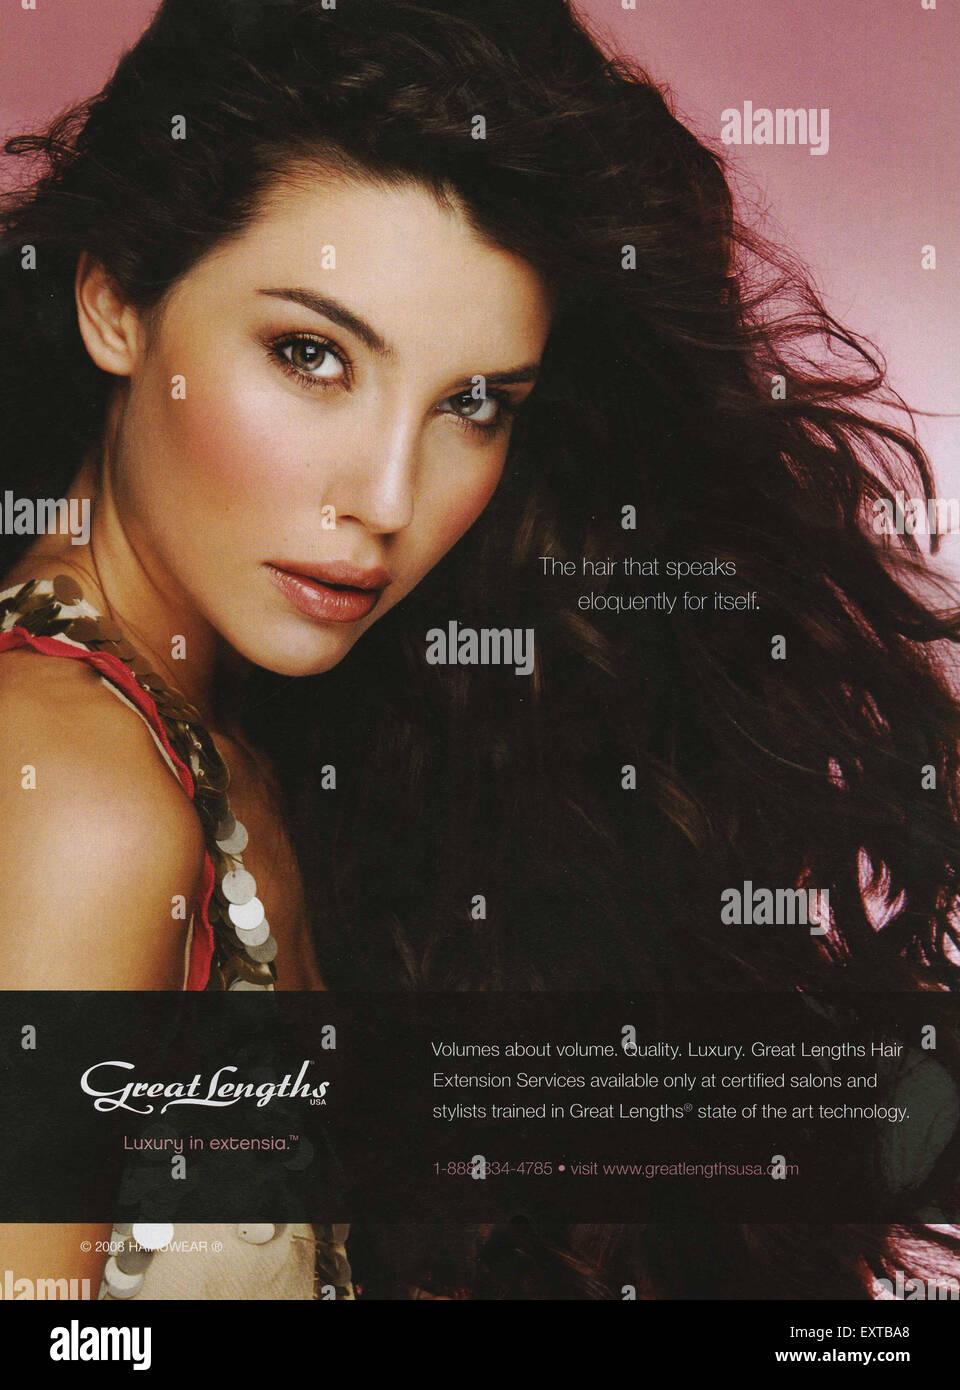 2000s USA Great Lengths Magazine Advert - Stock Image